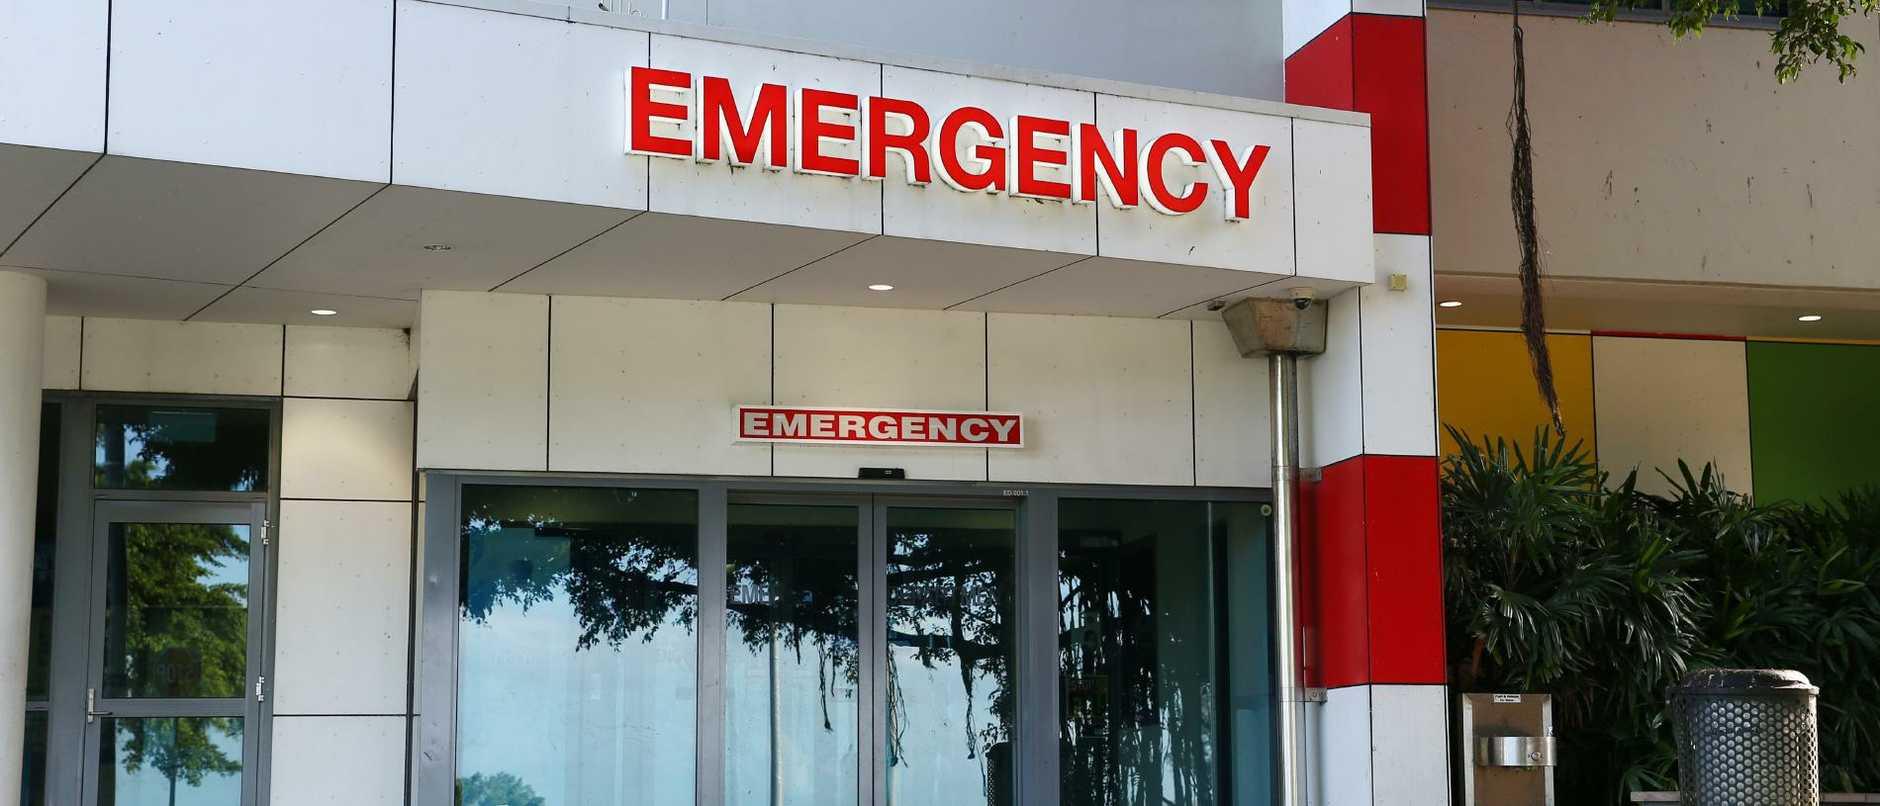 Cairns hospital's Emergency Department entry. PICTURE: BRENDAN RADKE